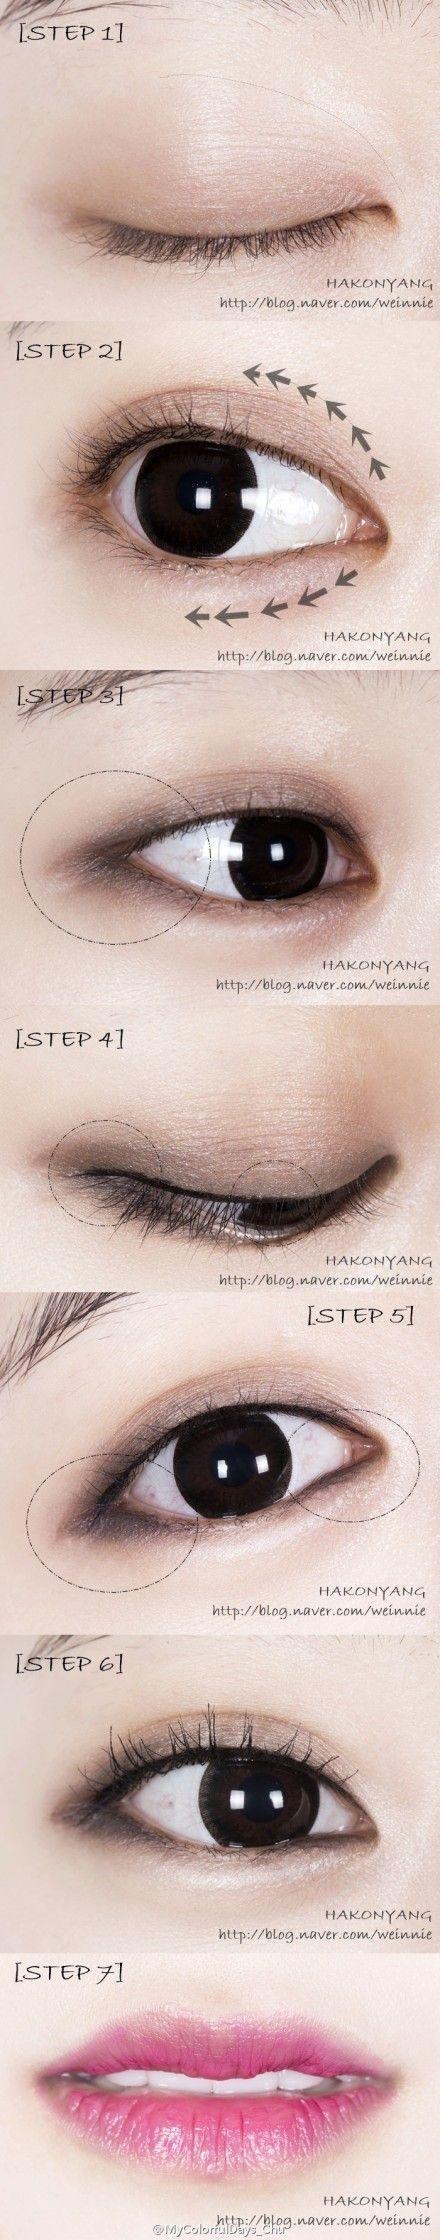 Efdcdffdadg pixels makeup and